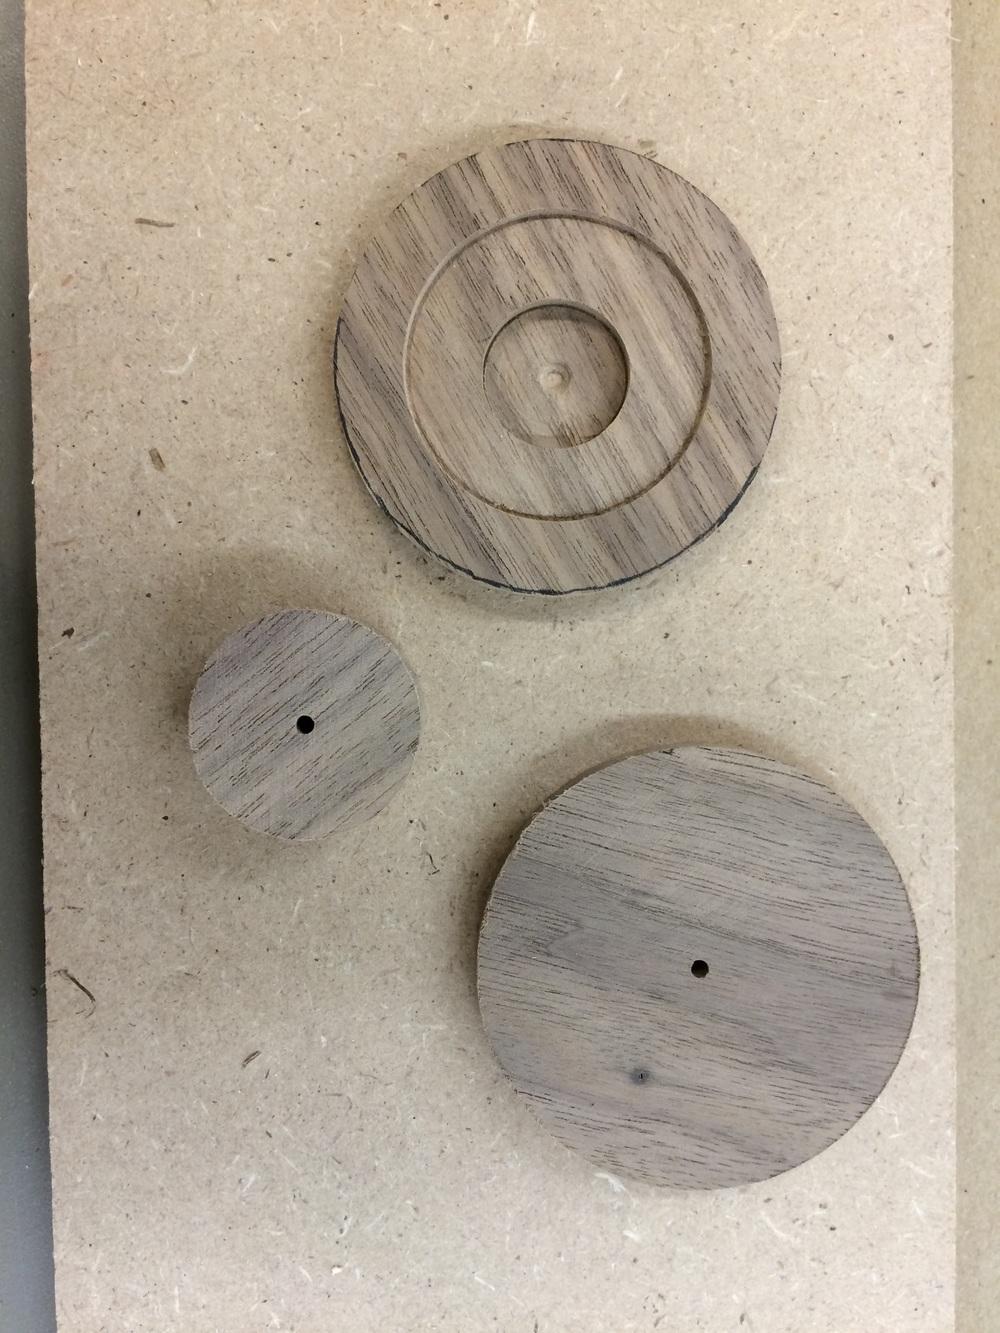 spool parts